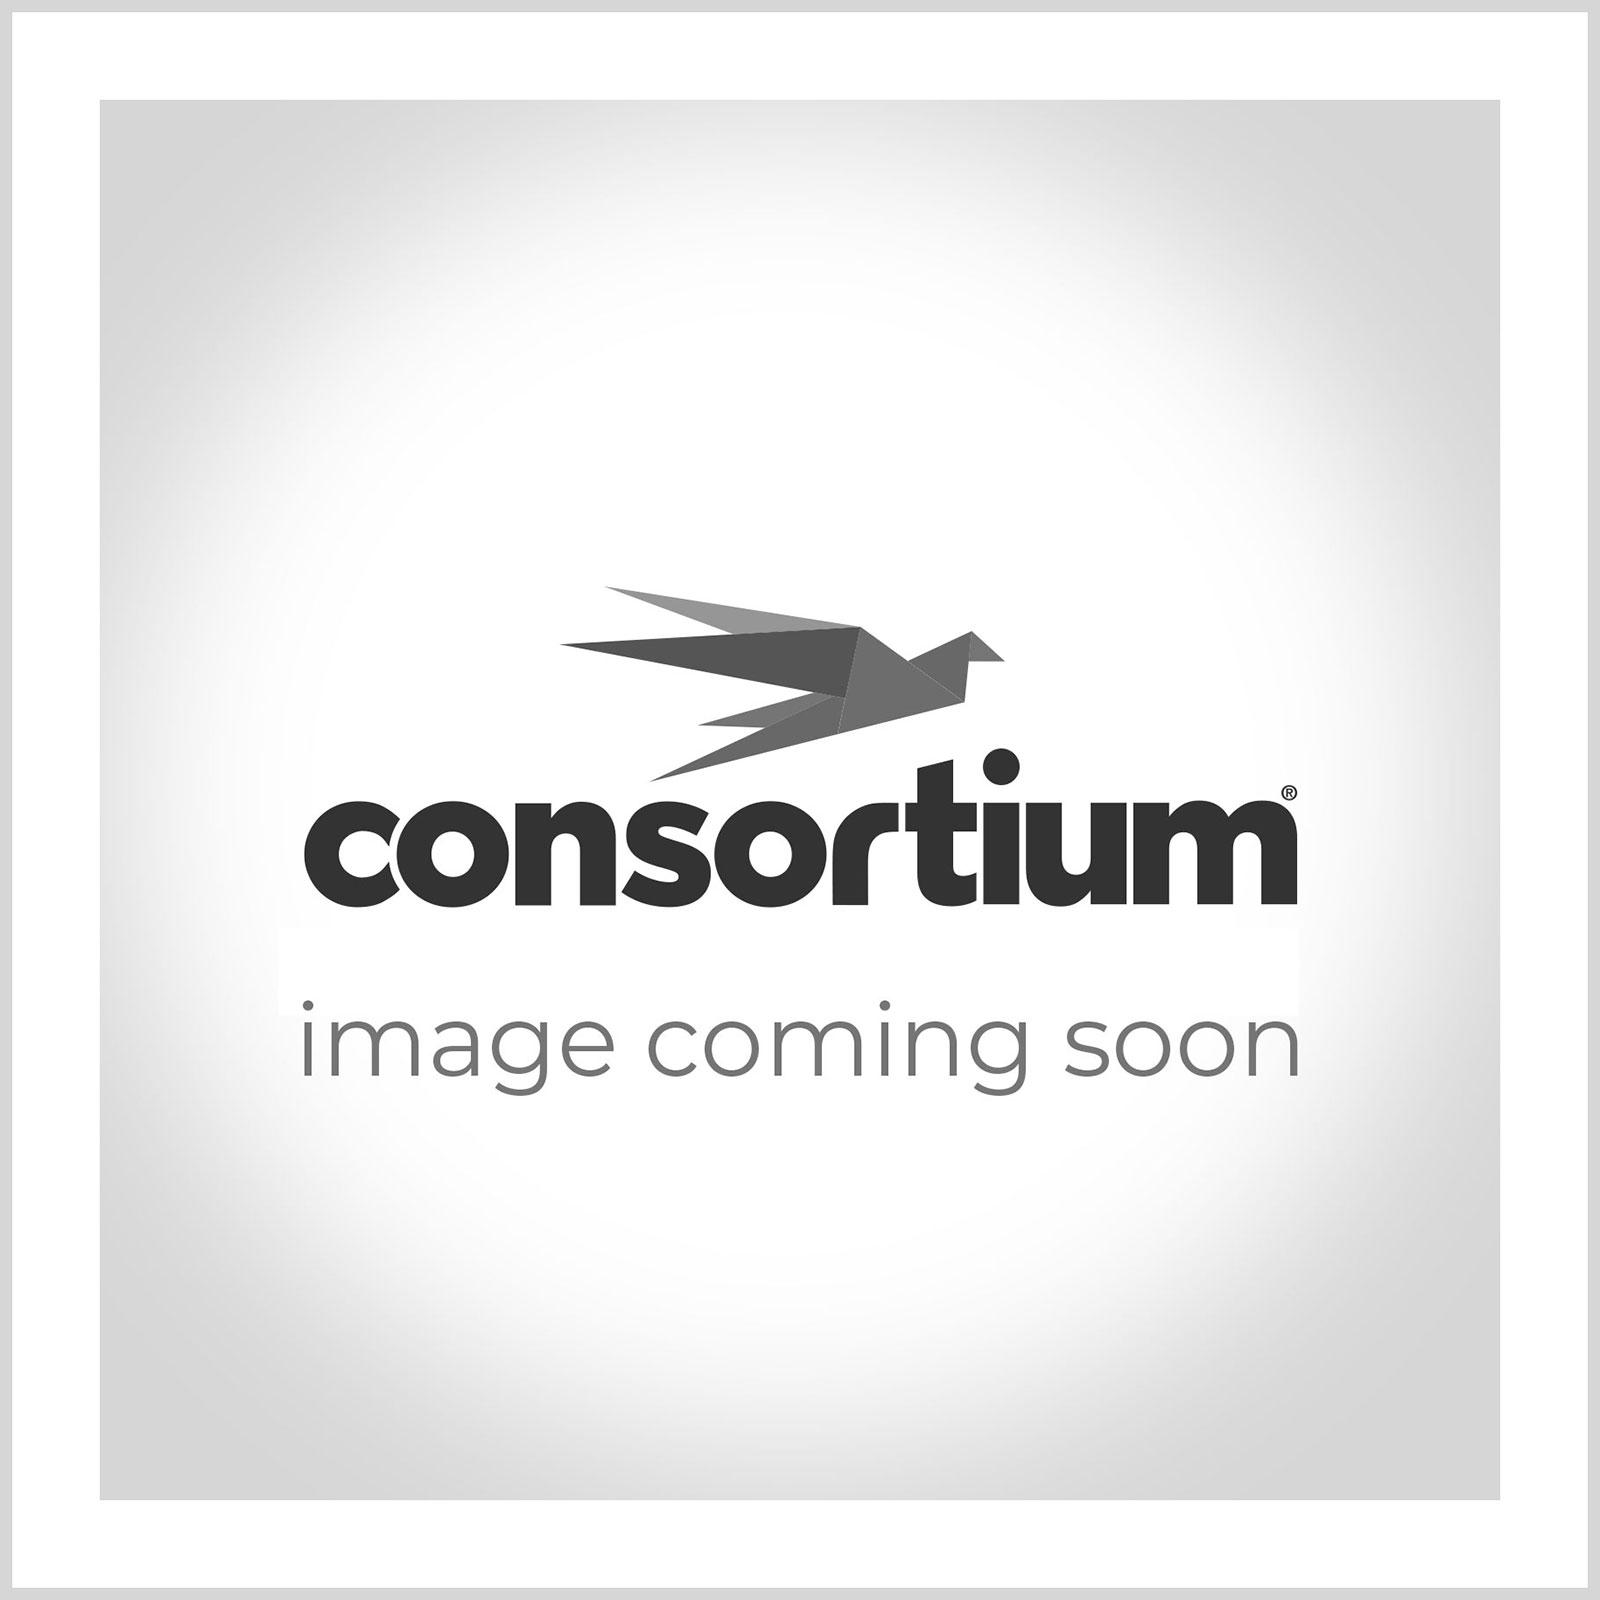 The Consortium PVC Covering Material Self-Adhesive